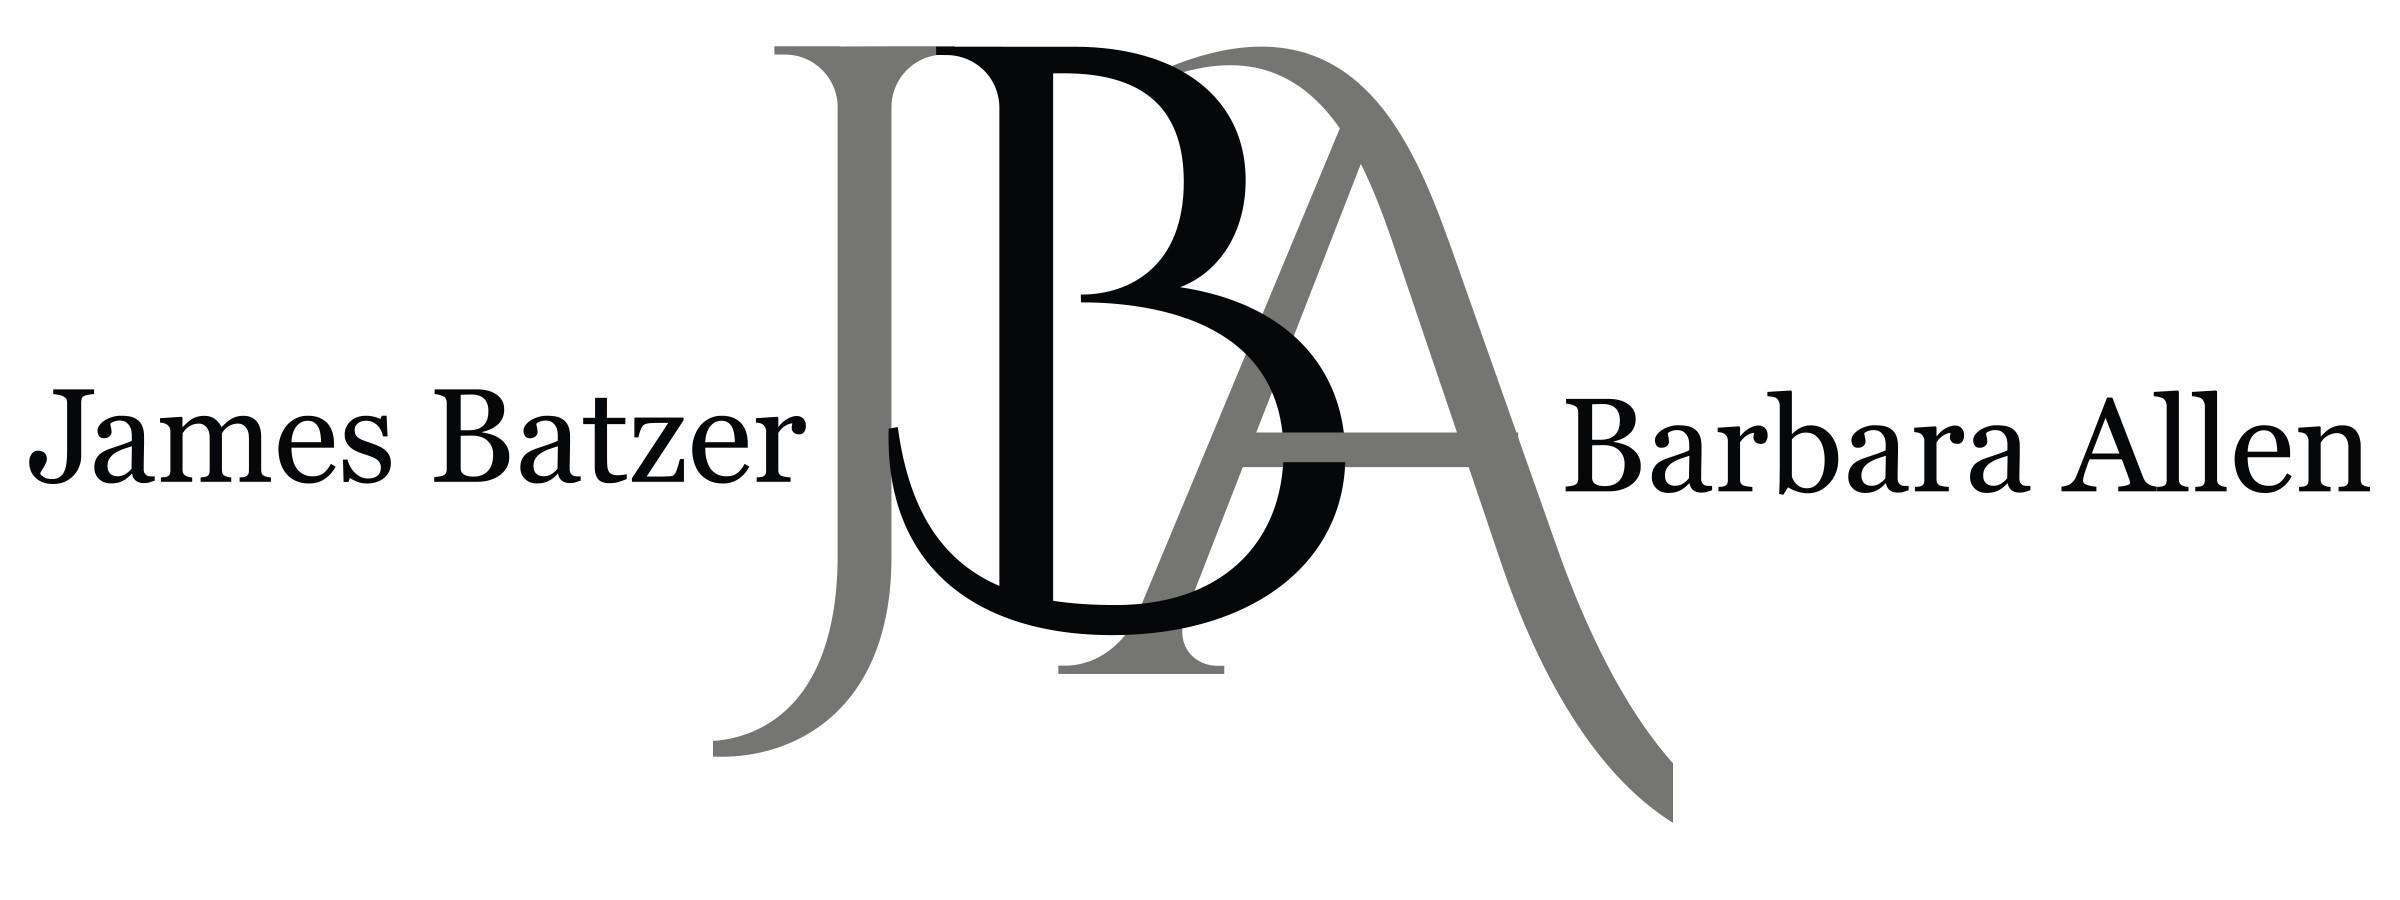 Batzer Allen LogoAd.jpg